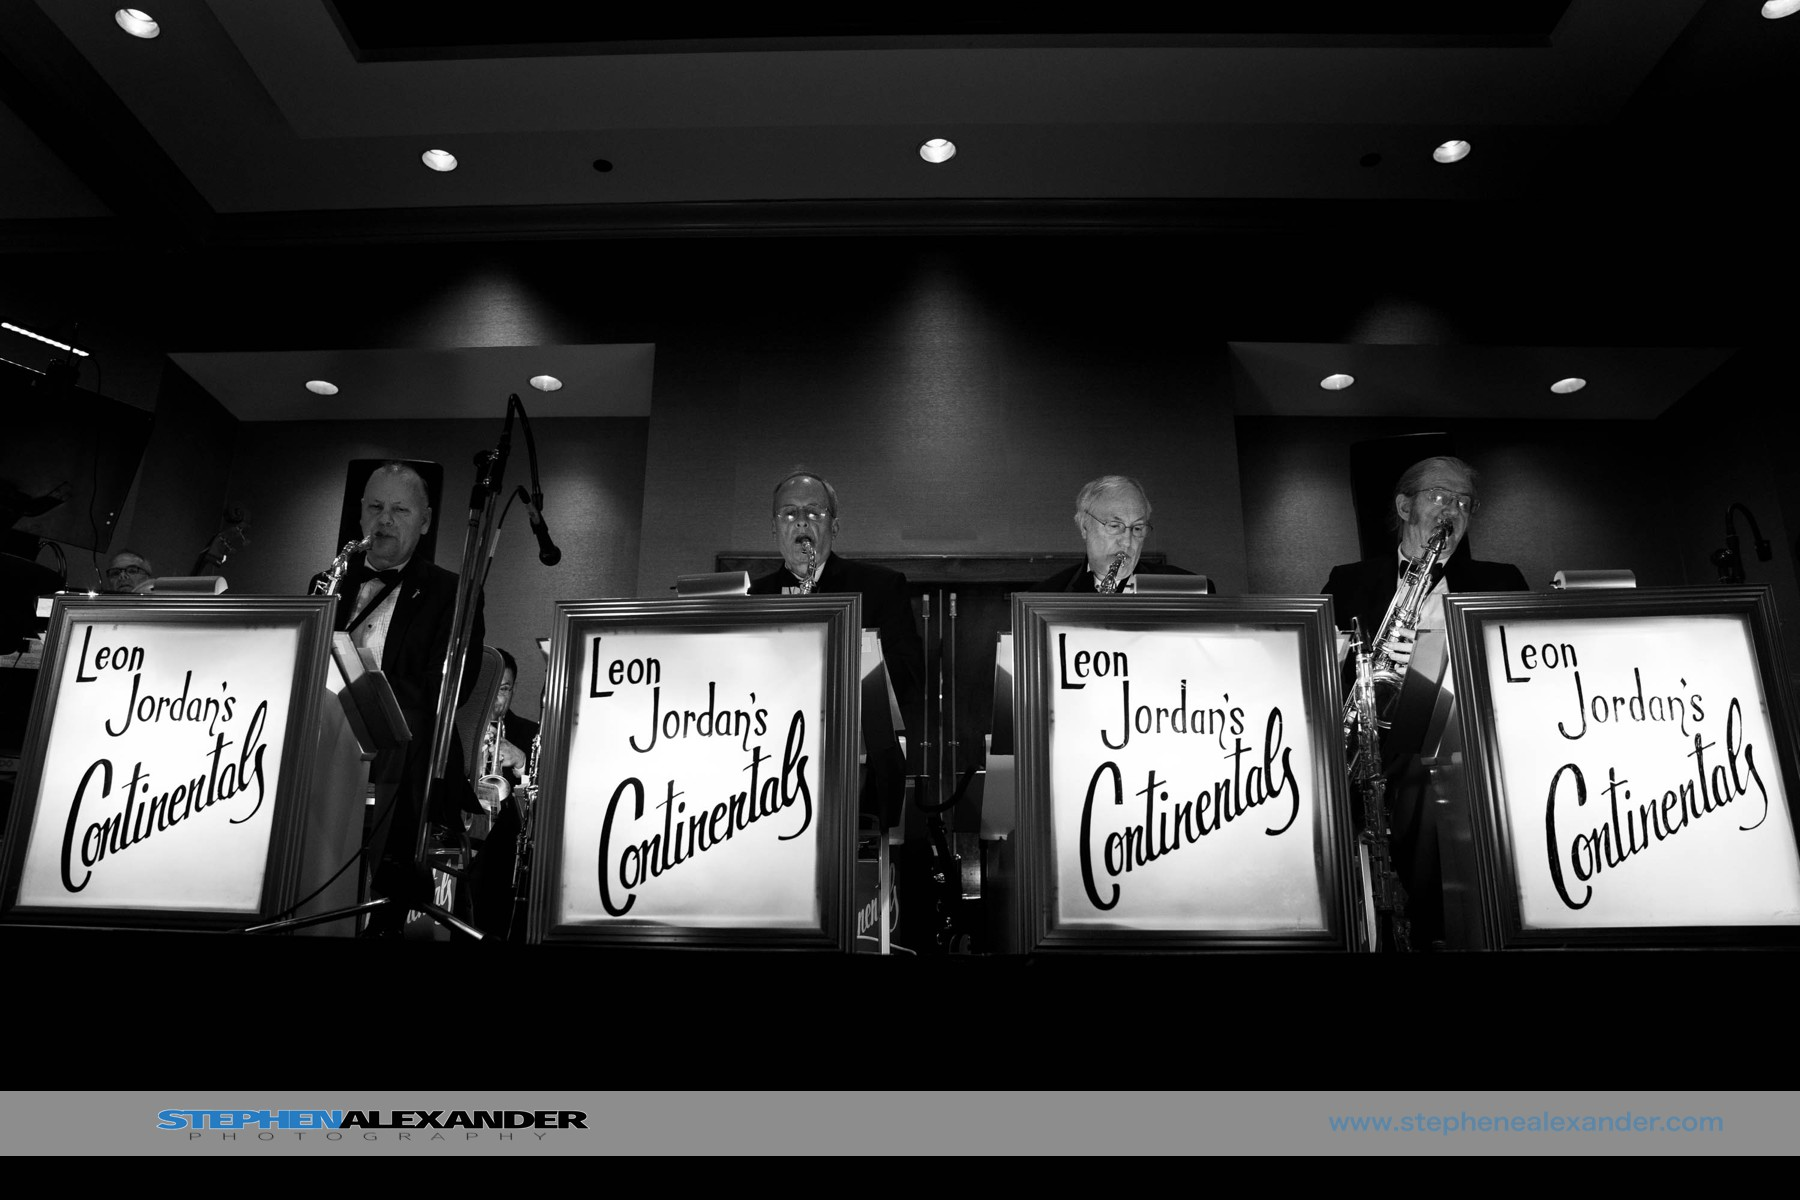 Leon Jordan's Continentals - Amazing!